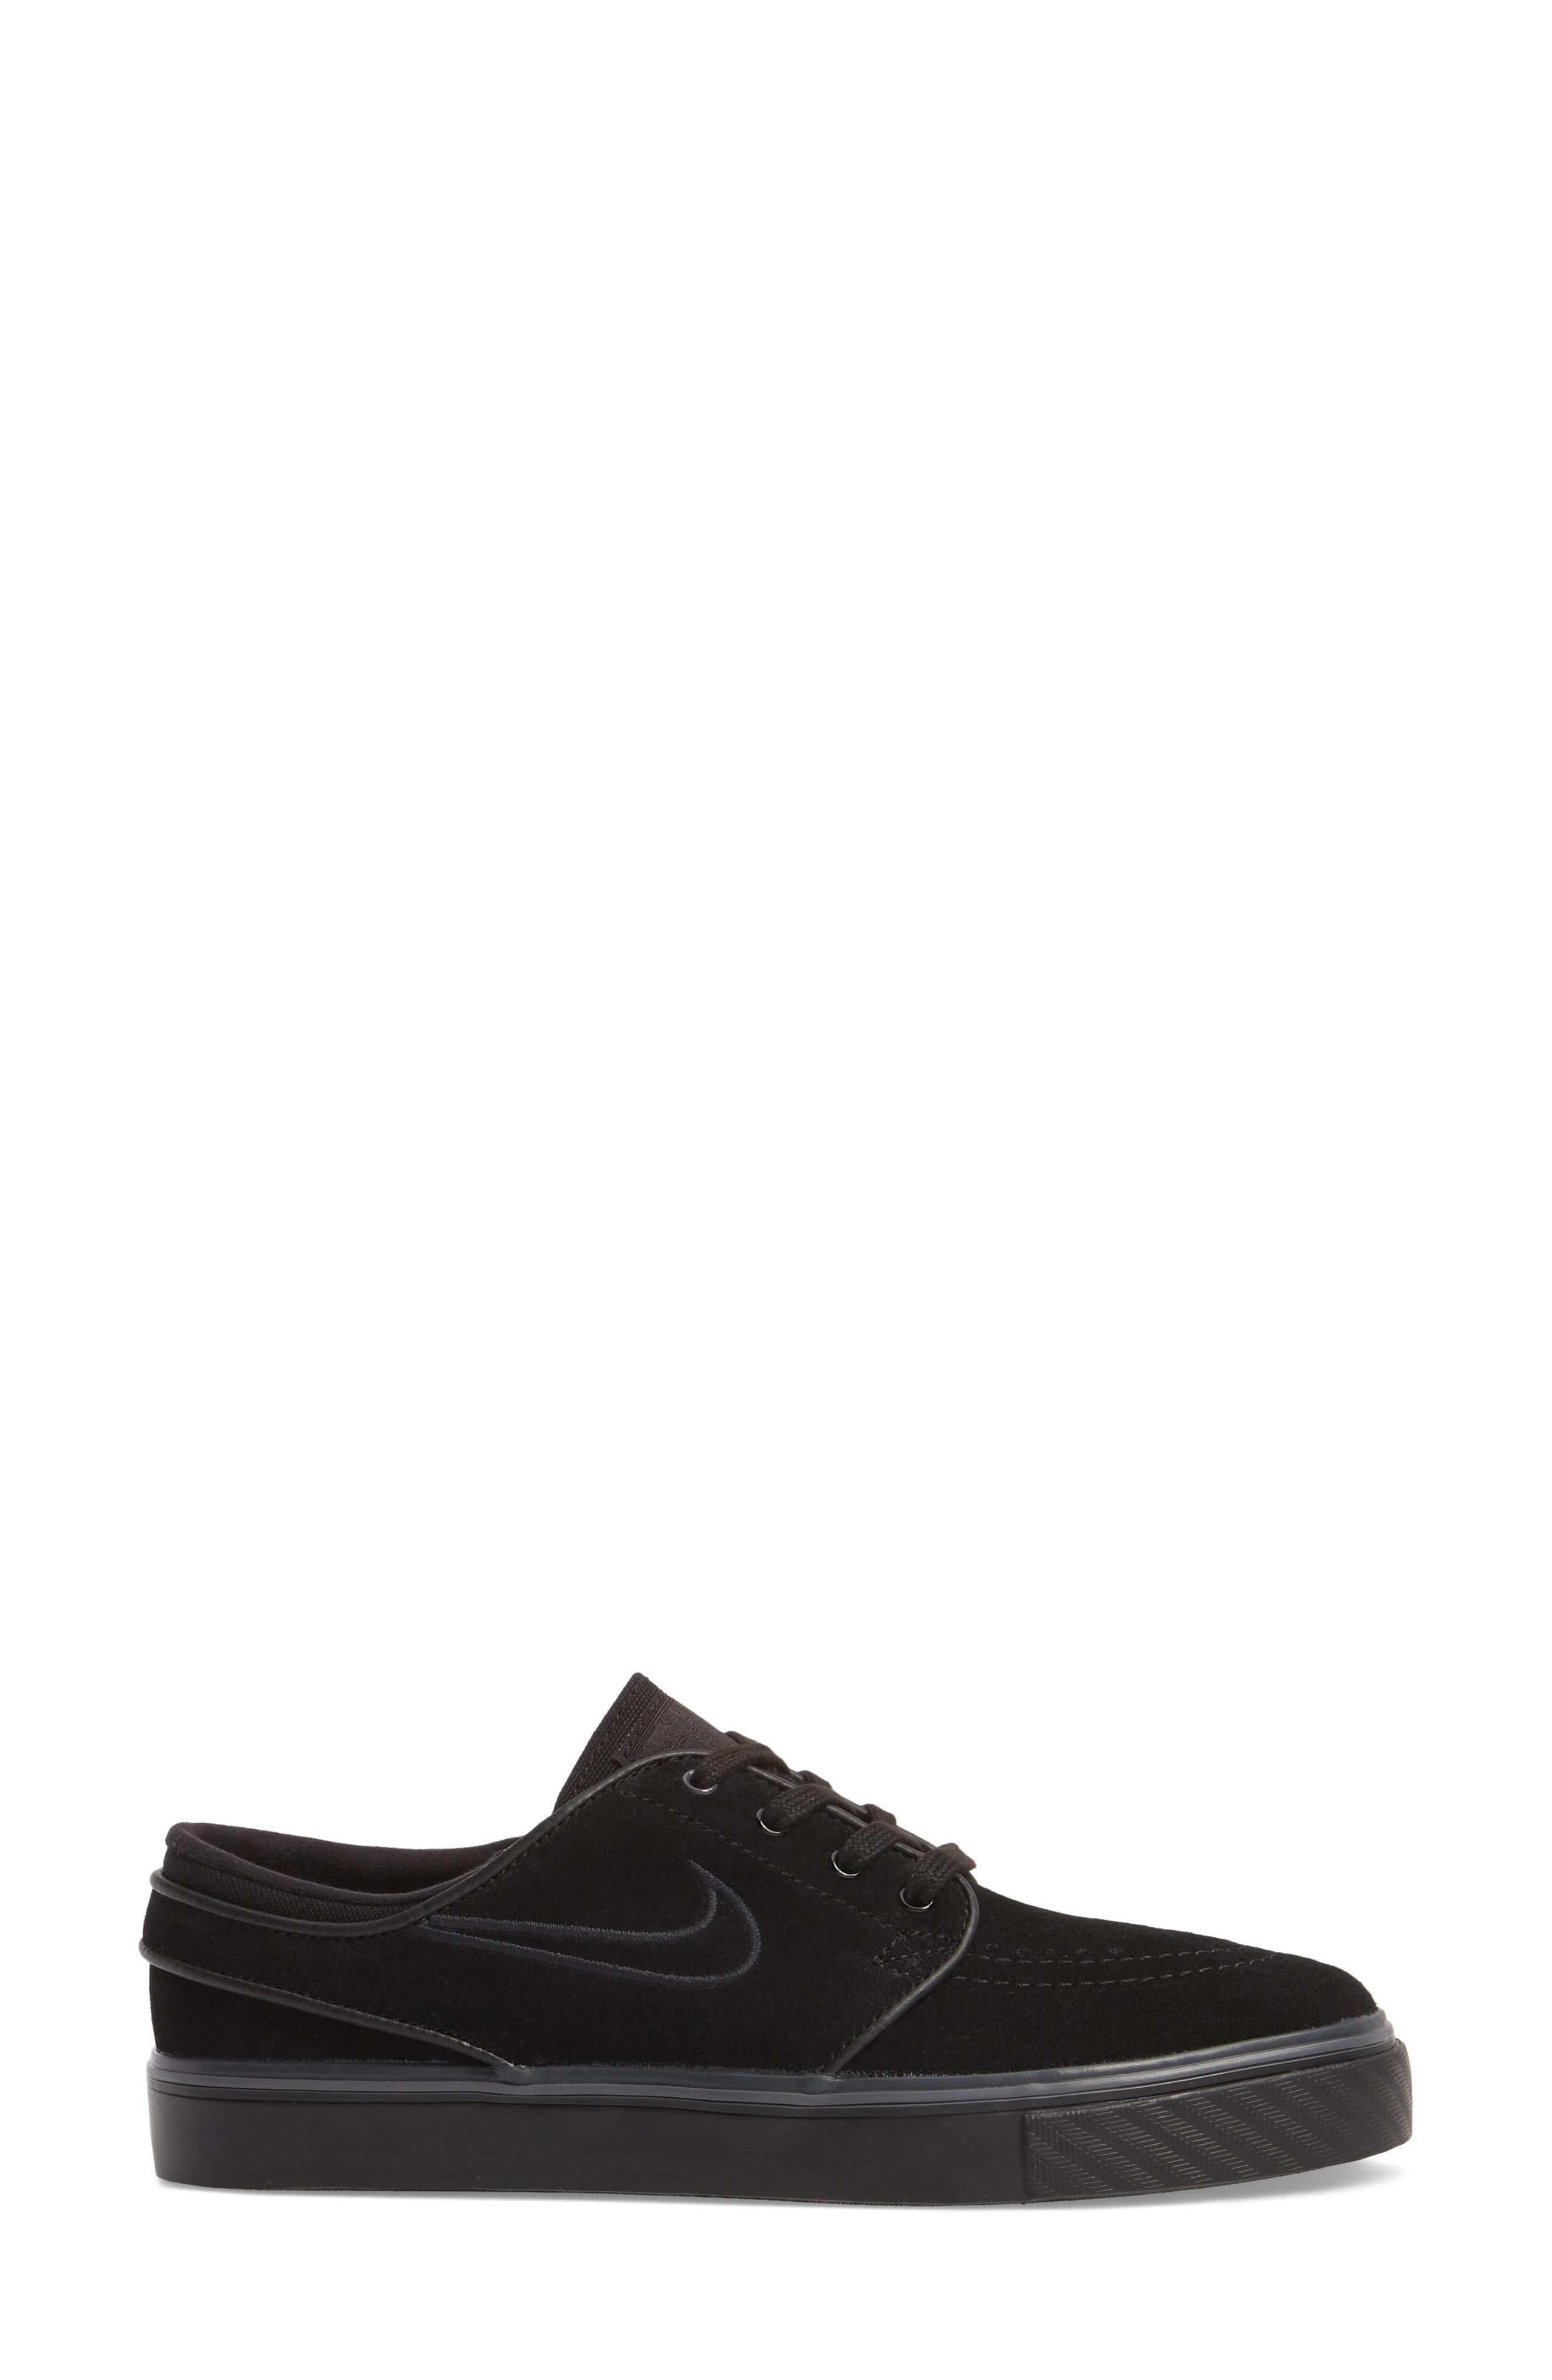 SB Air Zoom Stefan Janoski Skate Sneaker,                             Alternate thumbnail 3, color,                             BLACK/ BLACK/ BLACK